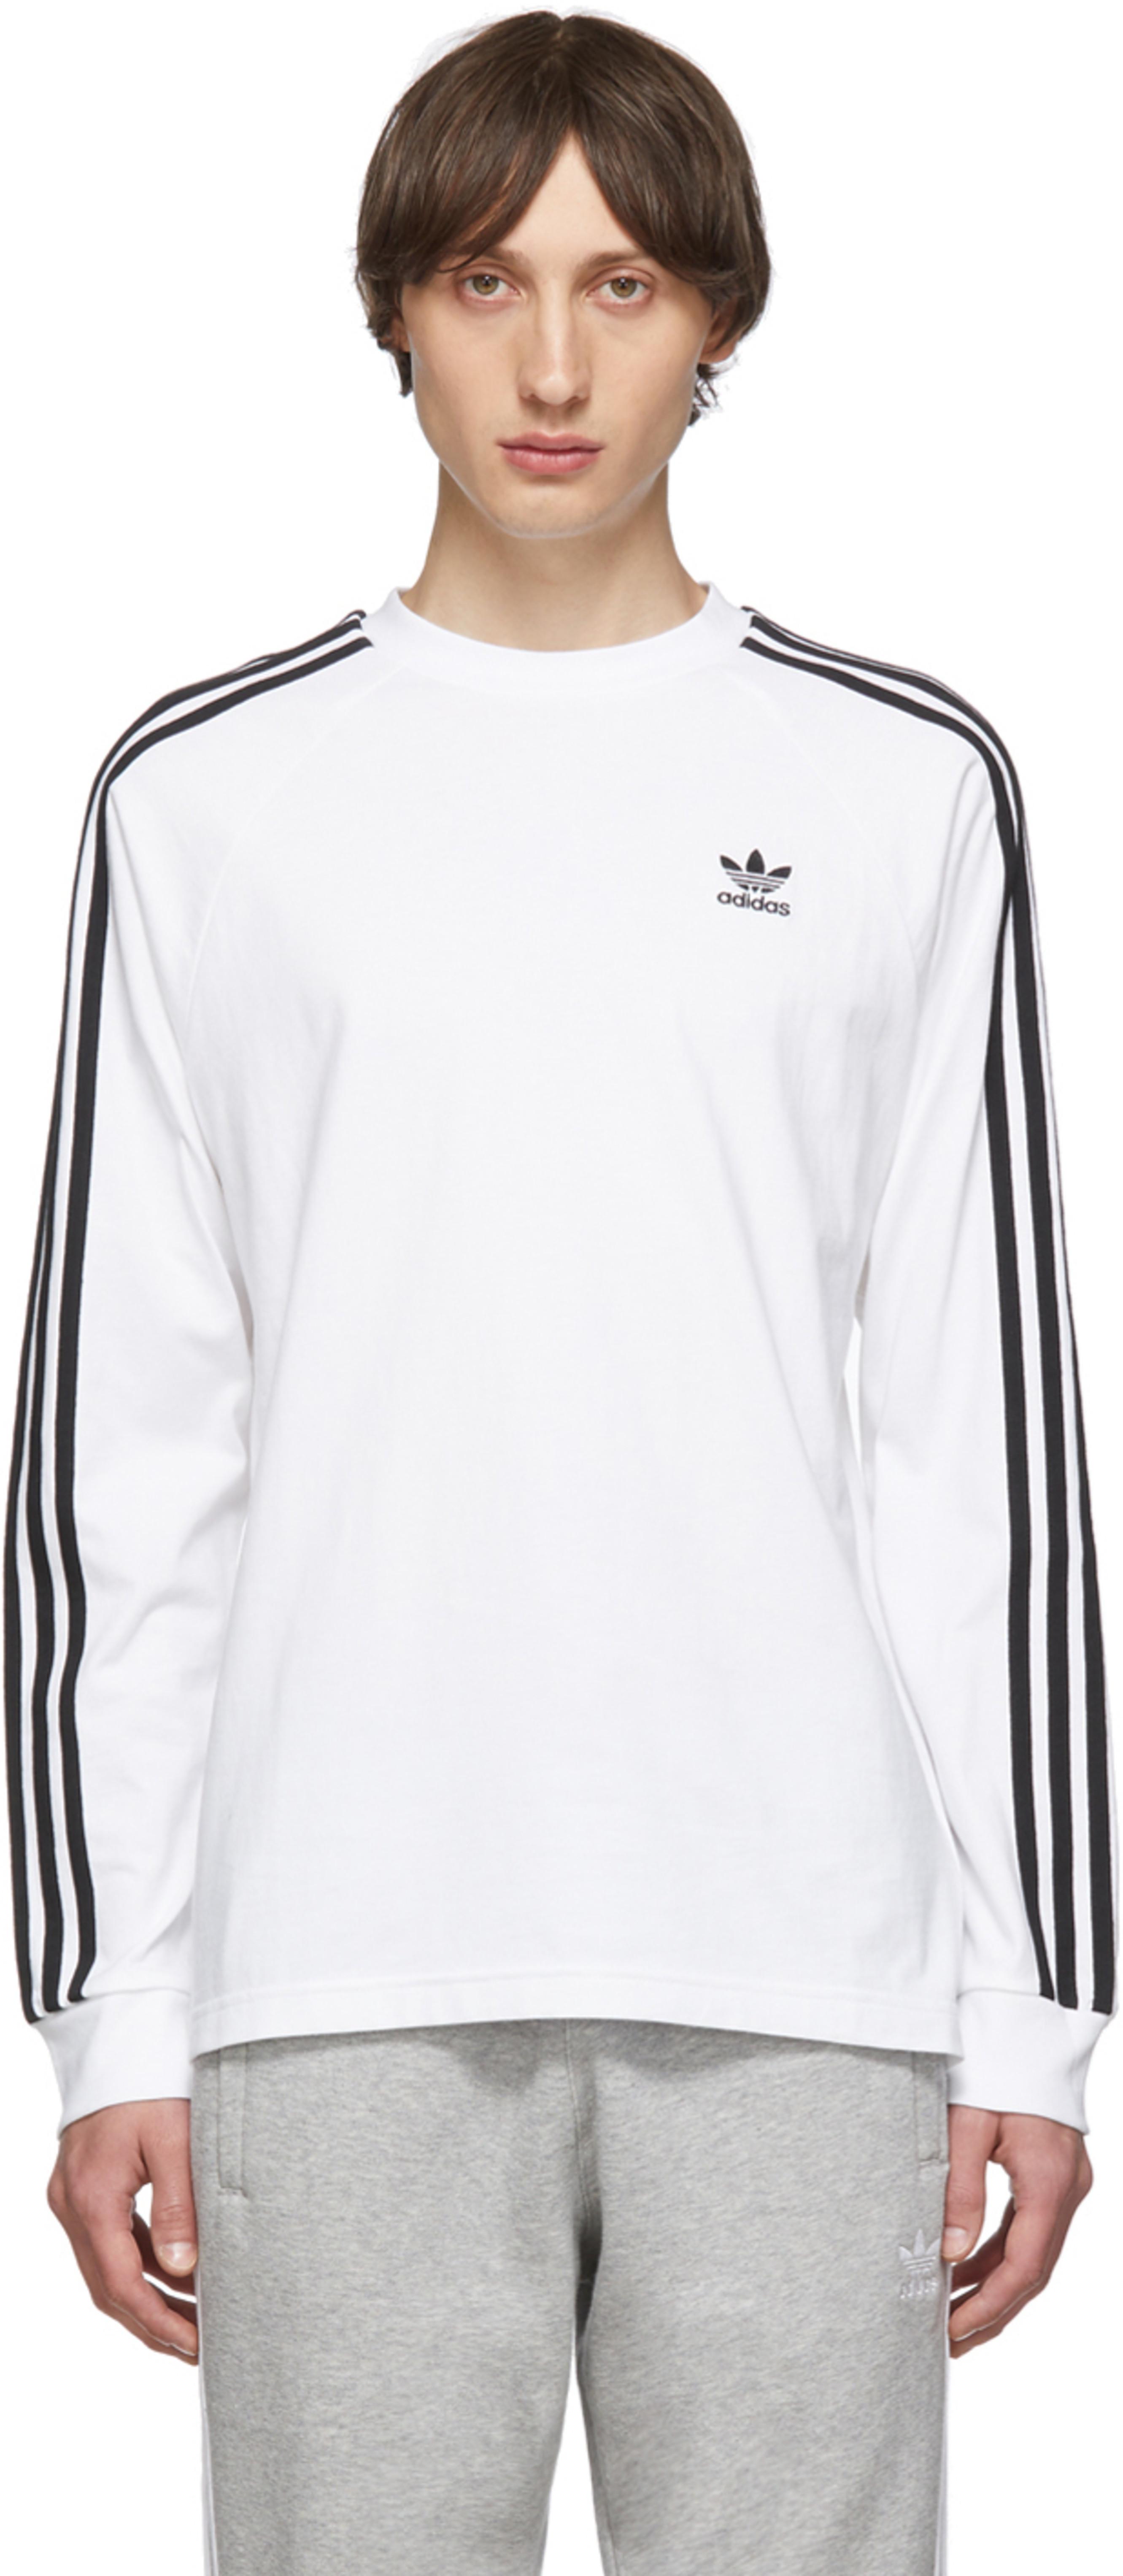 f842bc02b5023 Adidas Originals for Men SS19 Collection | SSENSE